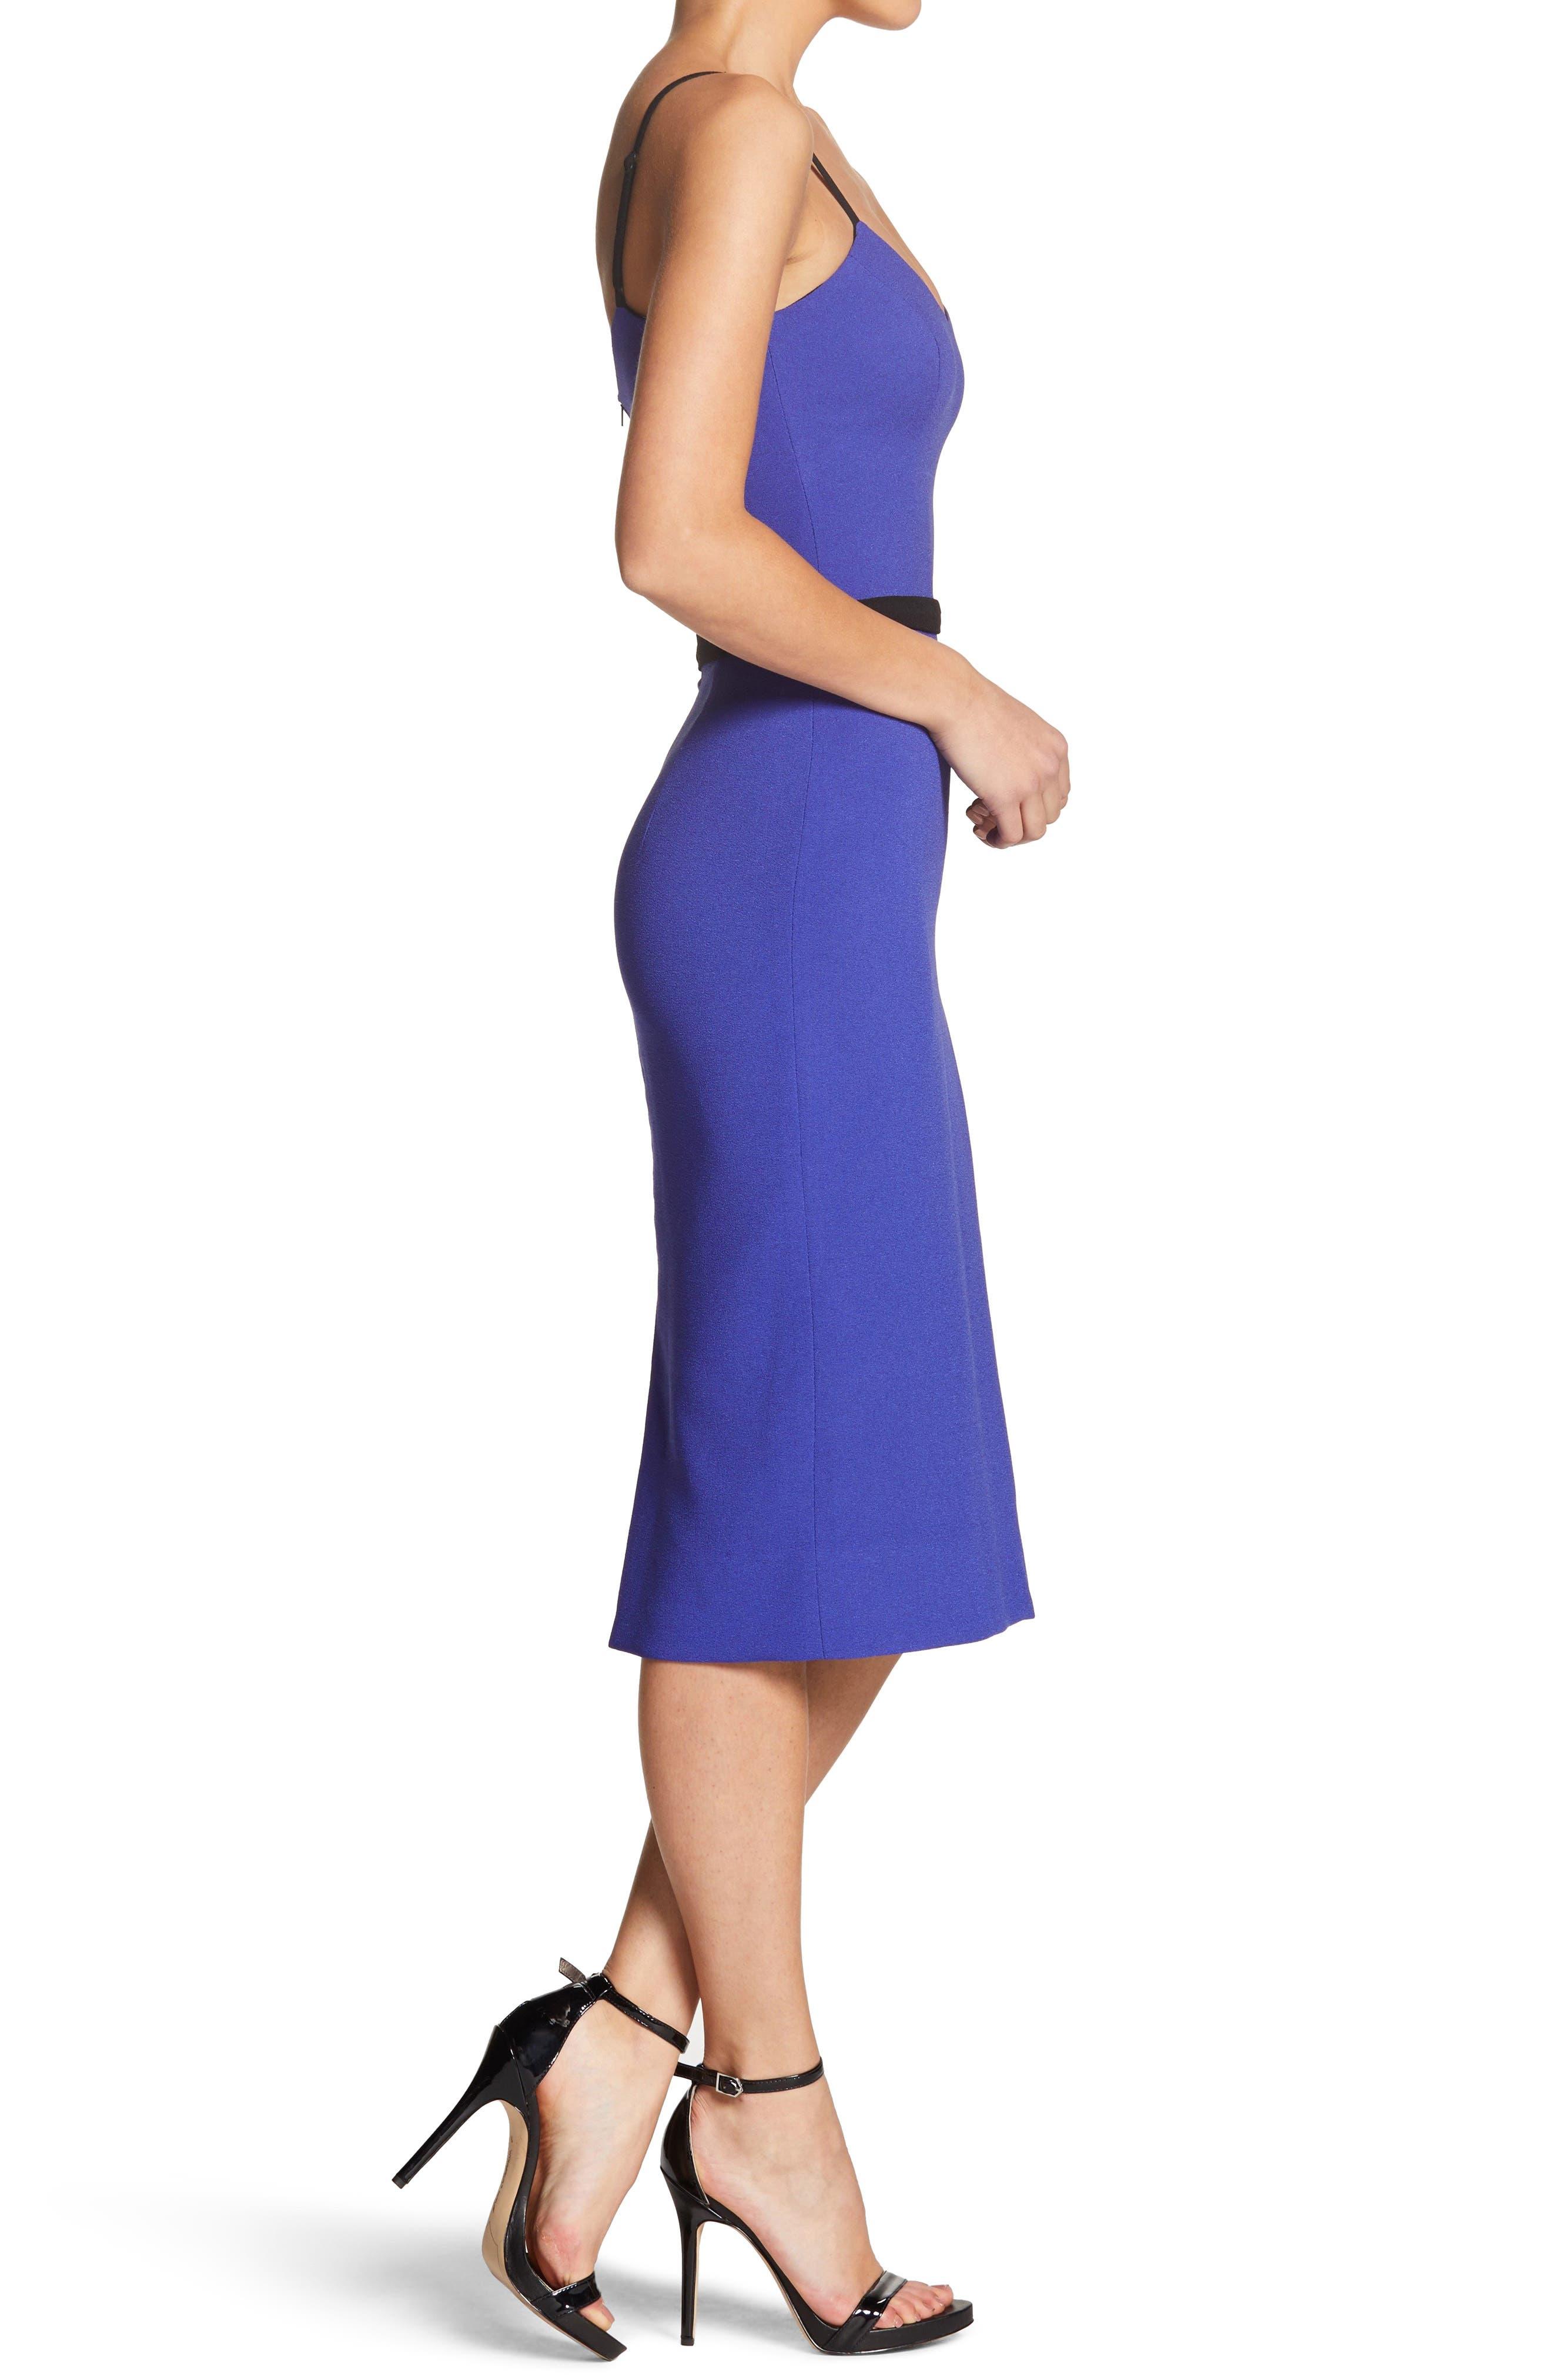 Emma Spaghetti Strap Body-Con Dress,                             Alternate thumbnail 3, color,                             BLUE/ VIOLET